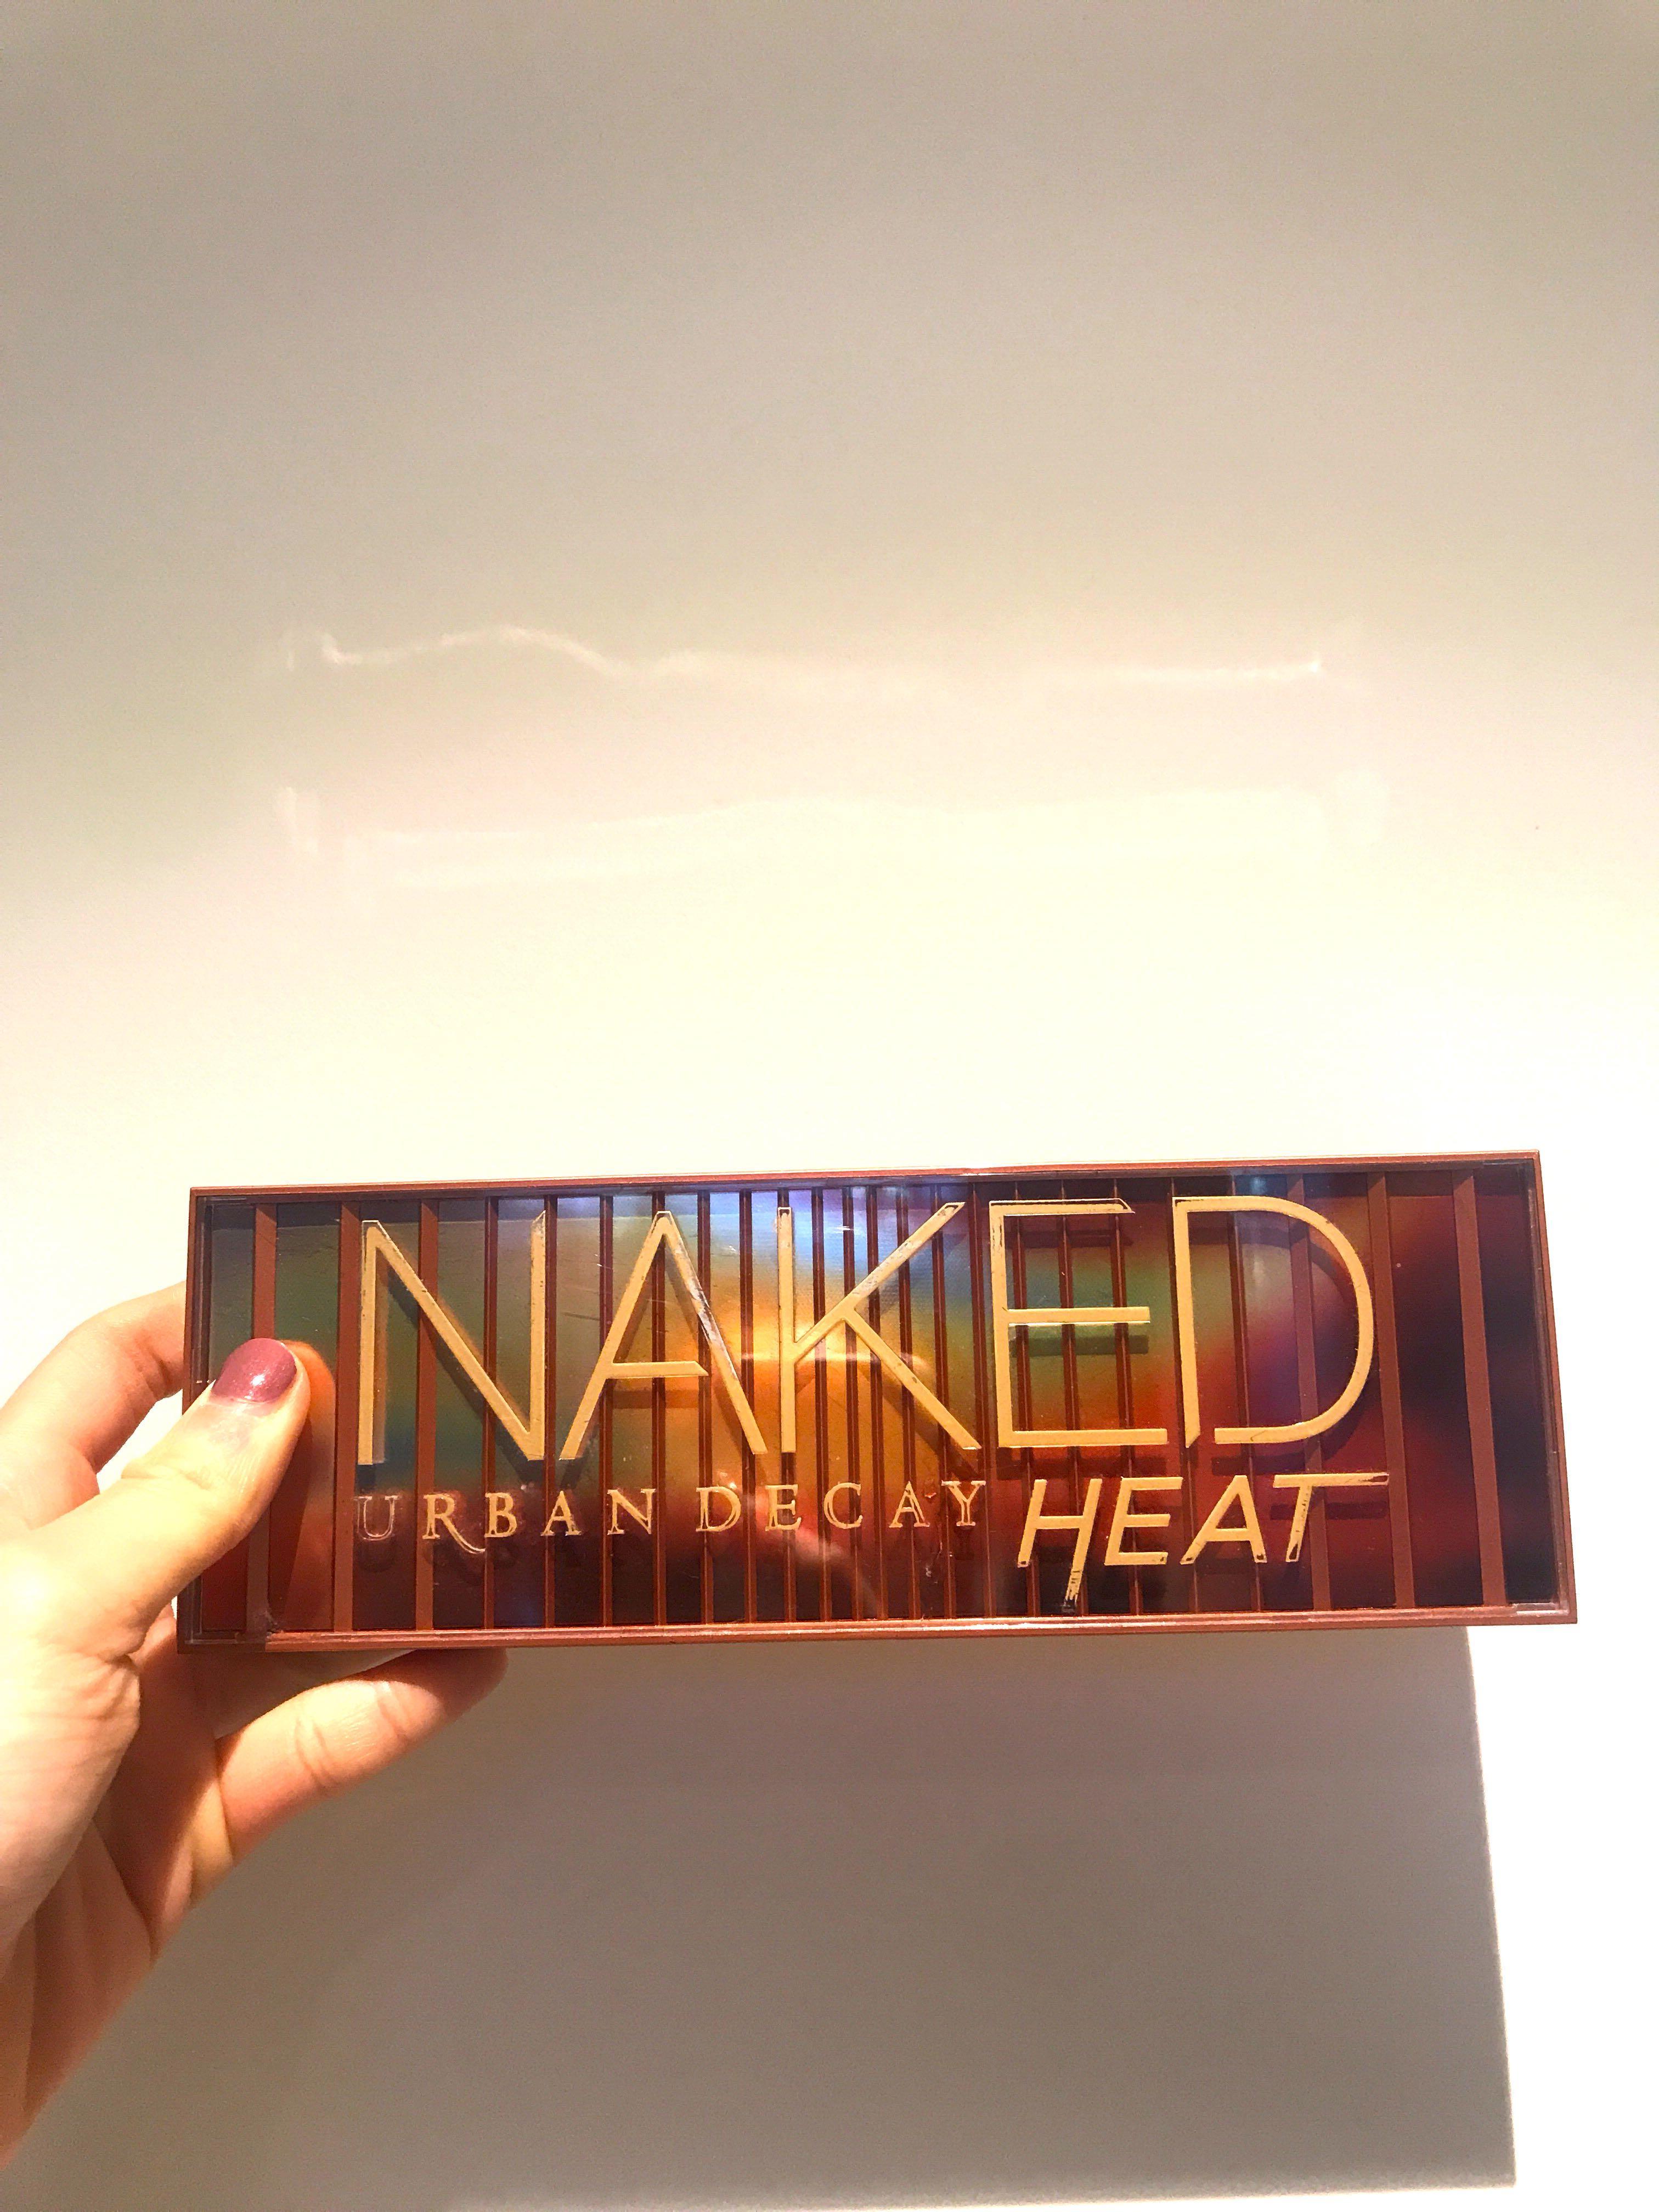 Urban Decay Naked Heat Palatte eyeshadow